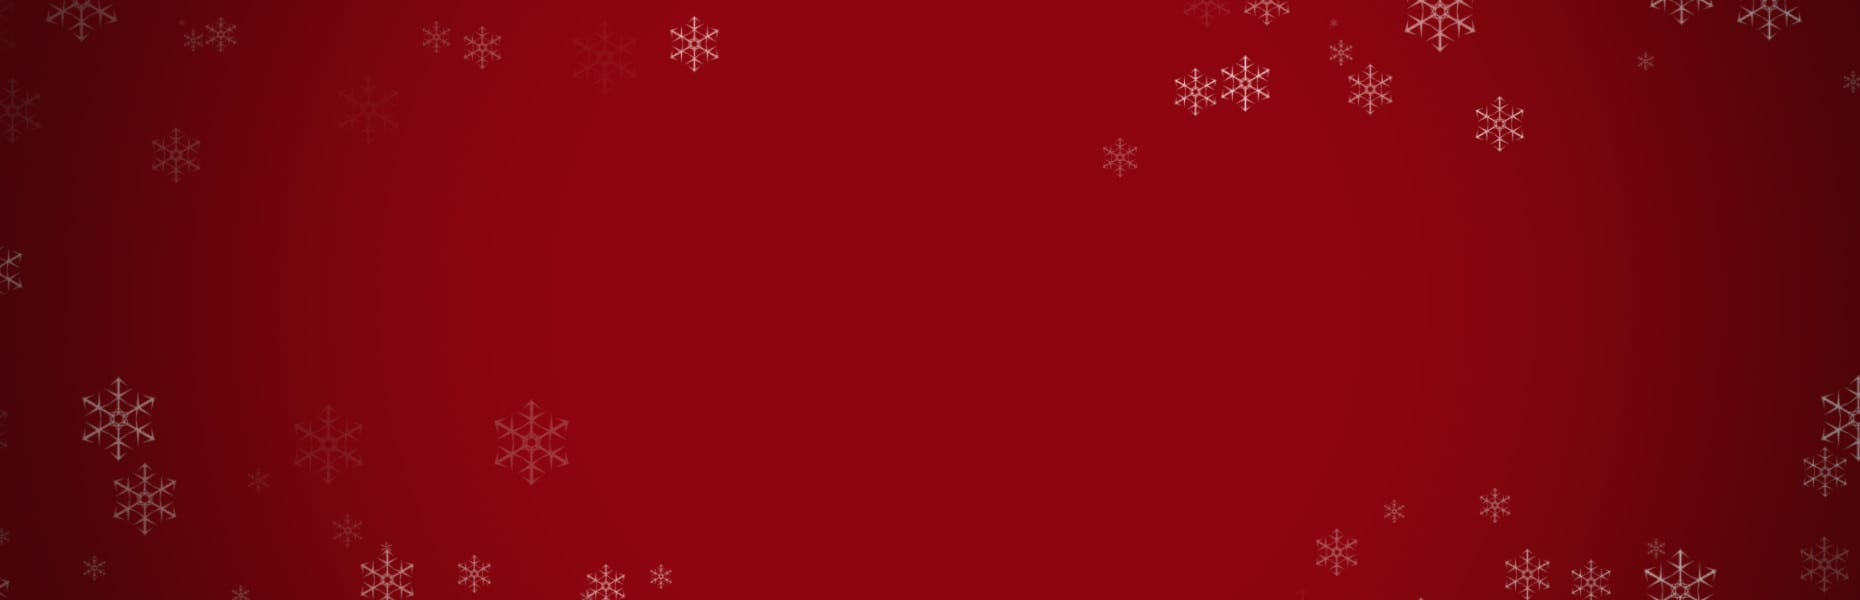 8909 Davys Christmas web banner 1966x600-RED-2018 v2